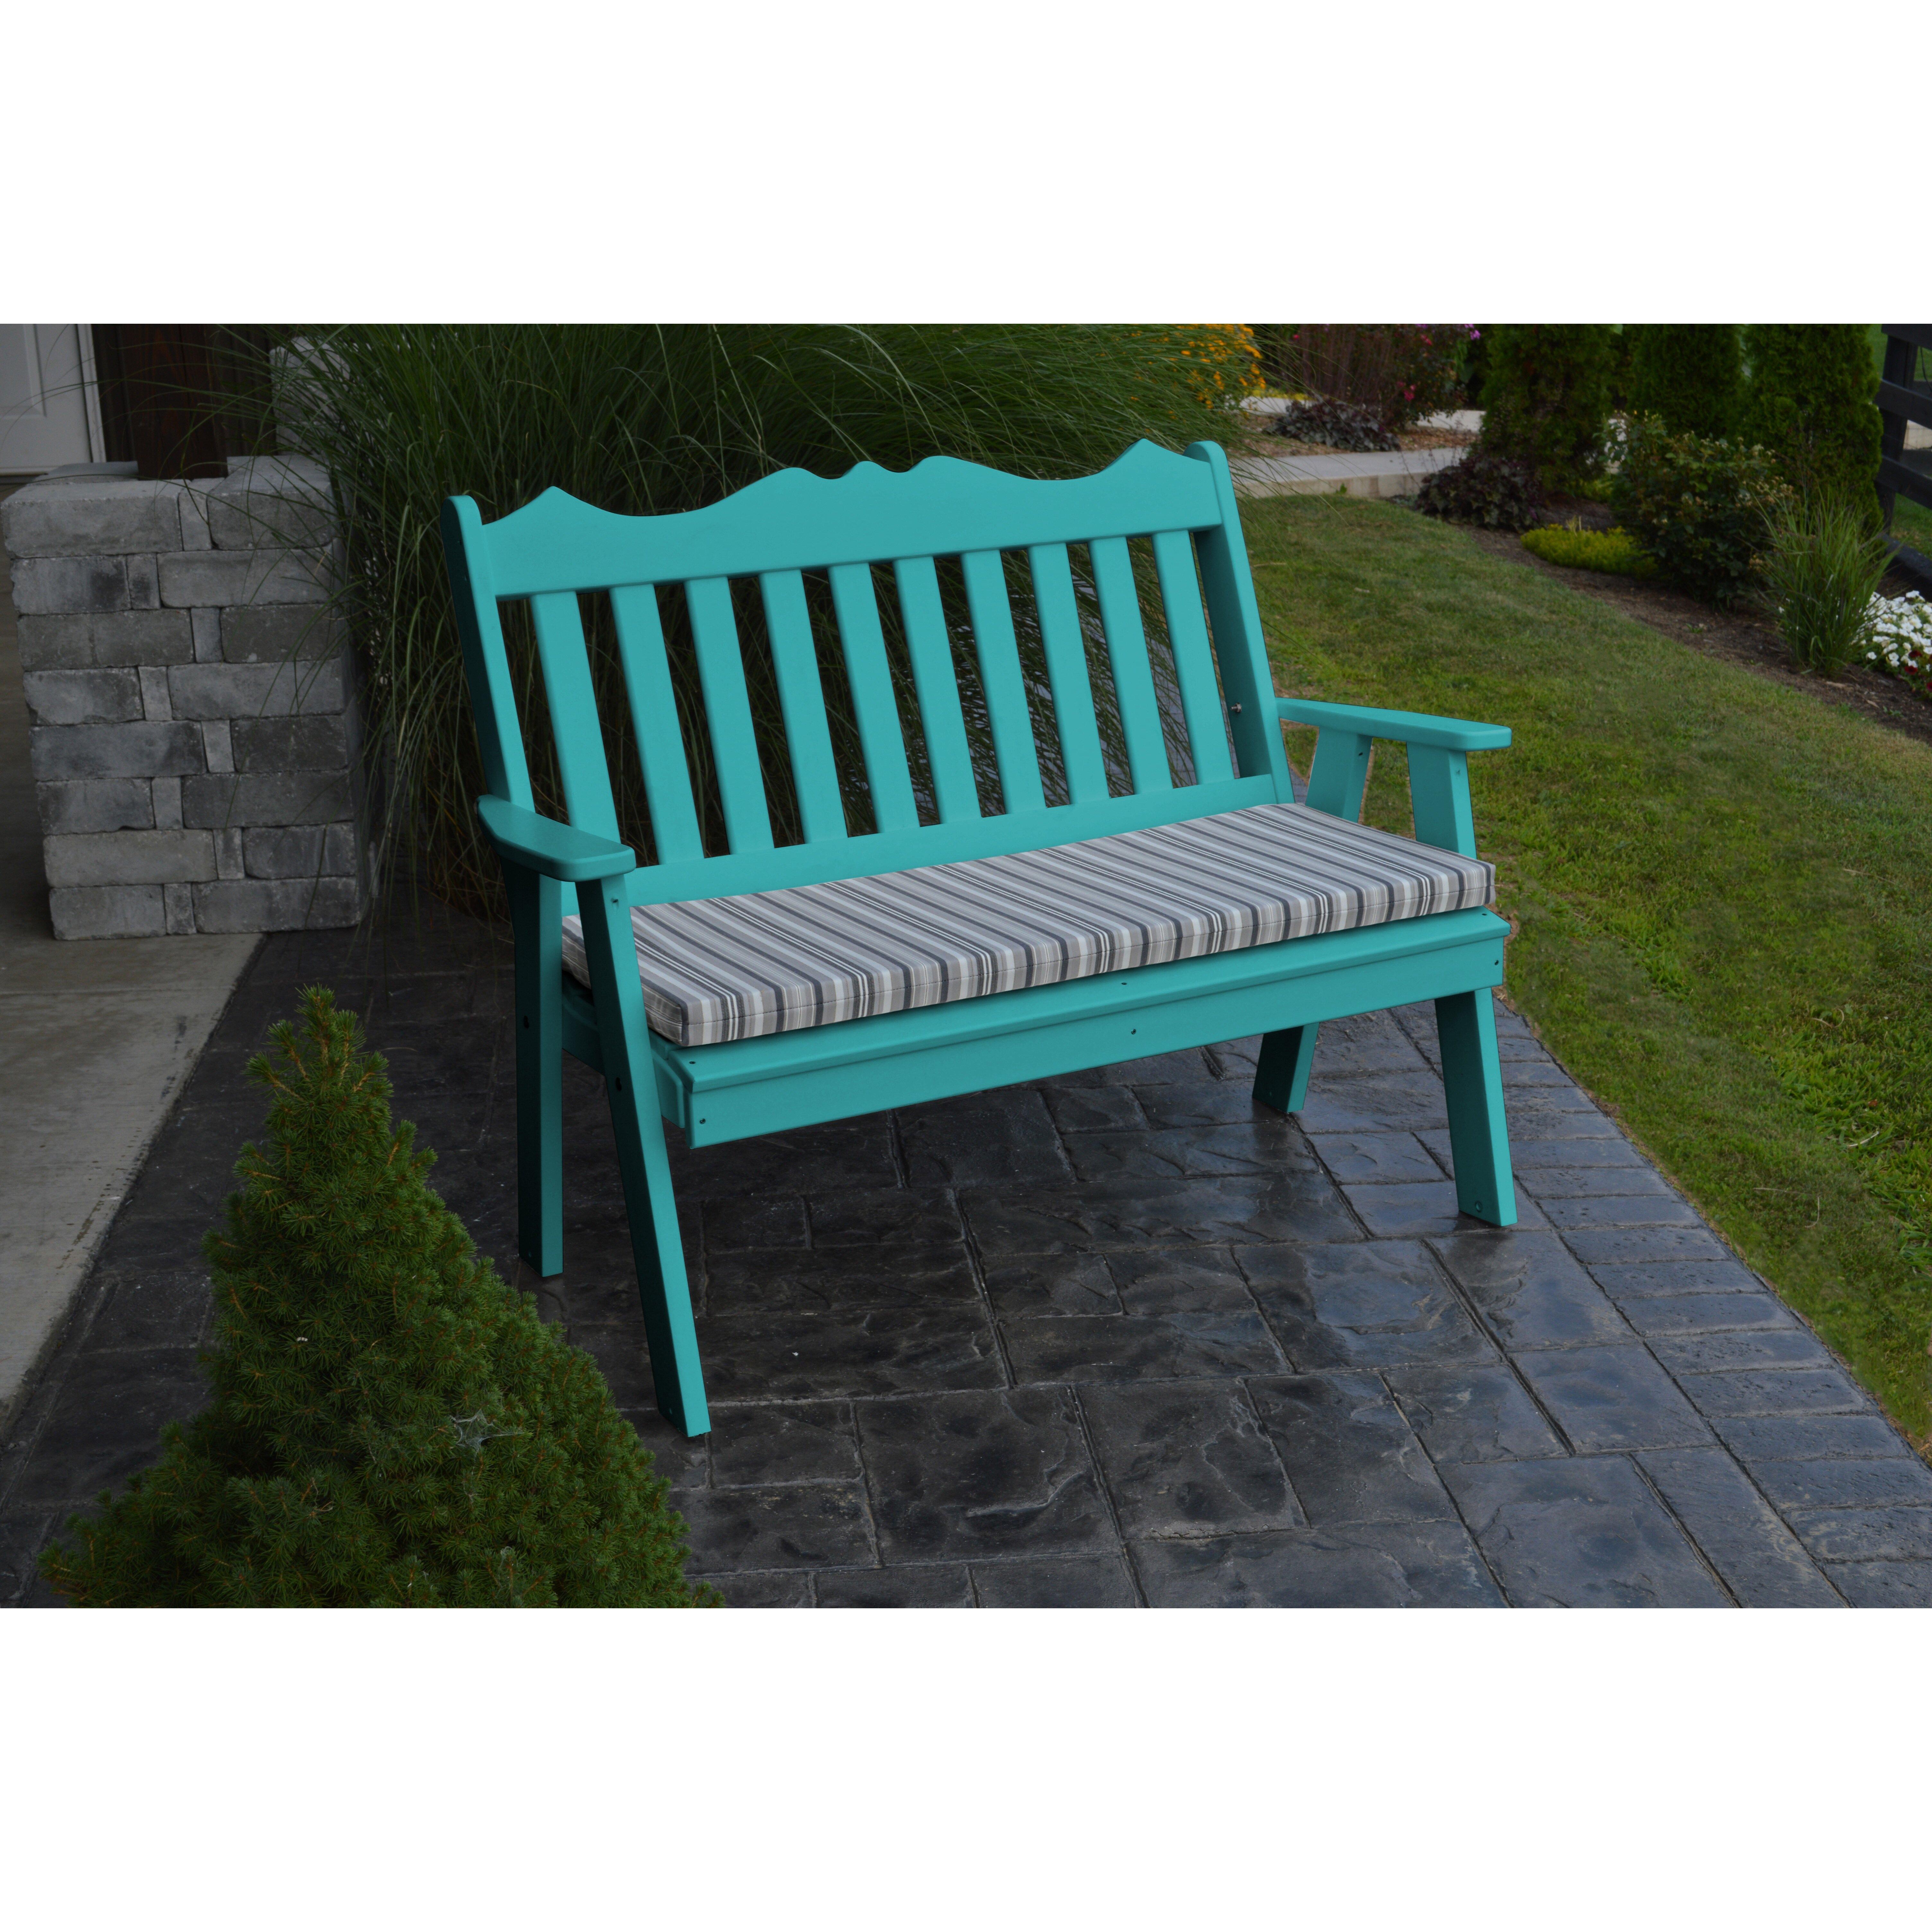 A L Furniture Royal English Garden Bench Reviews Wayfair